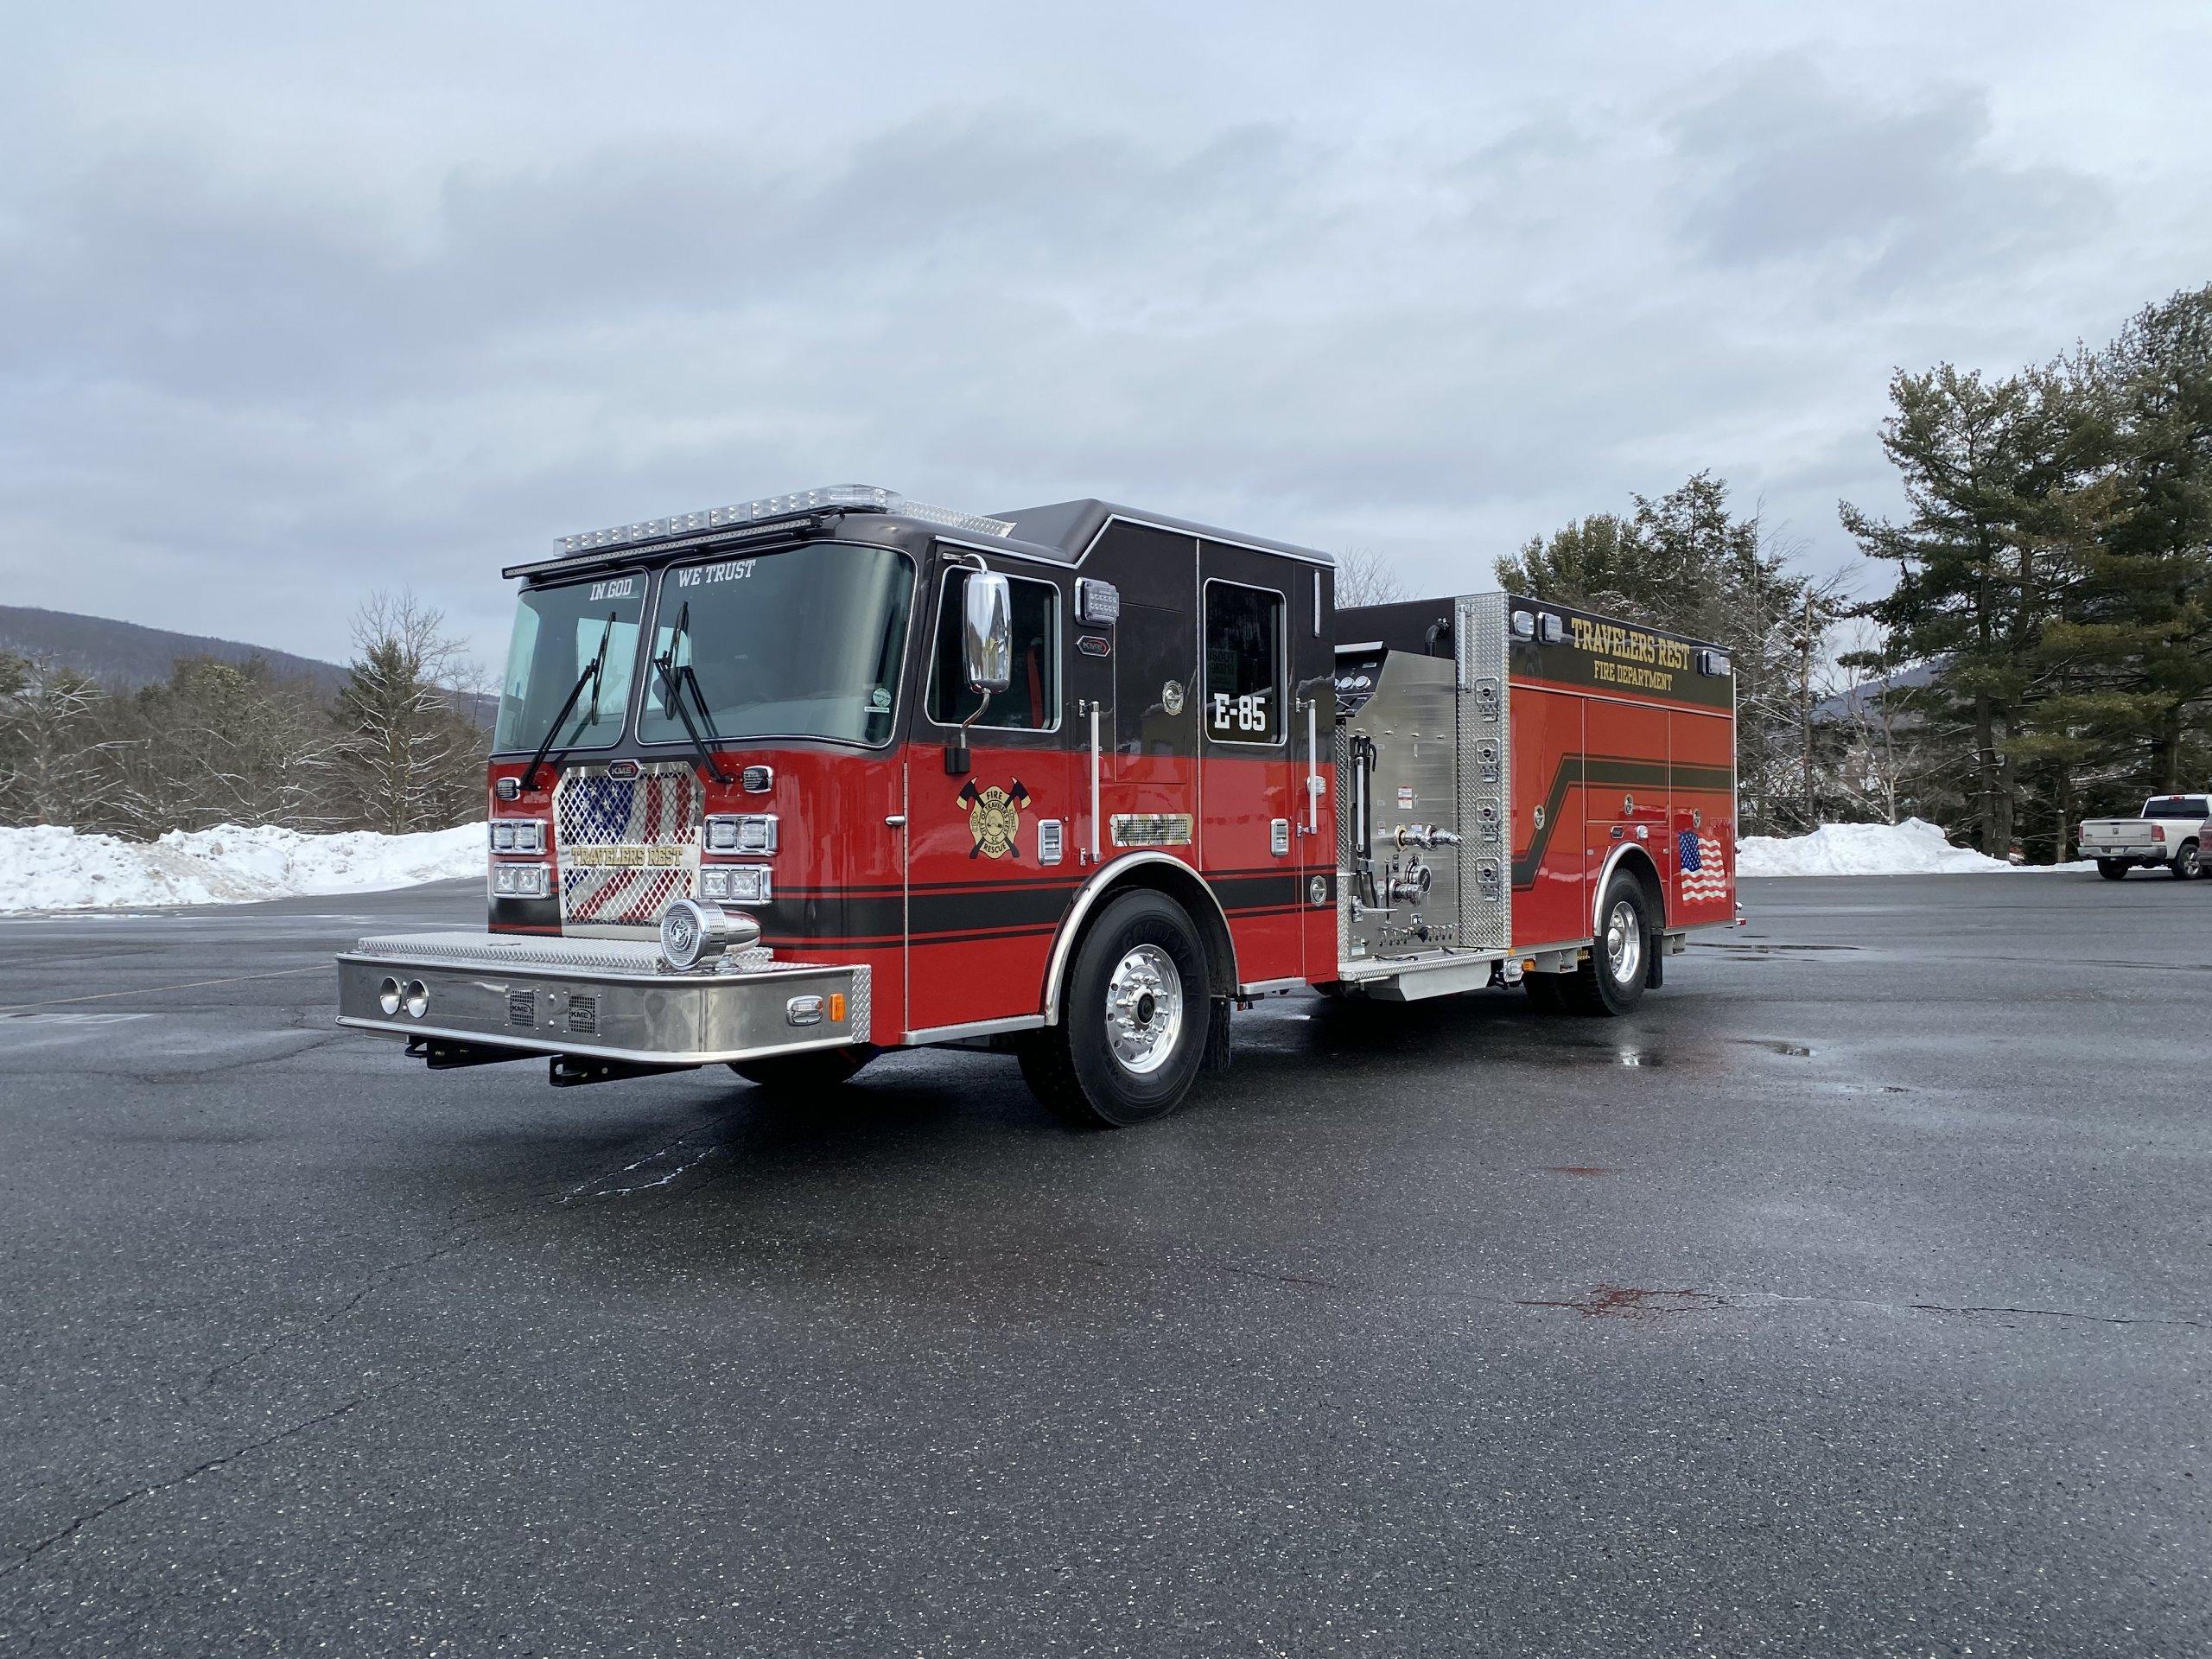 Travlers Rest Fire Department, SC